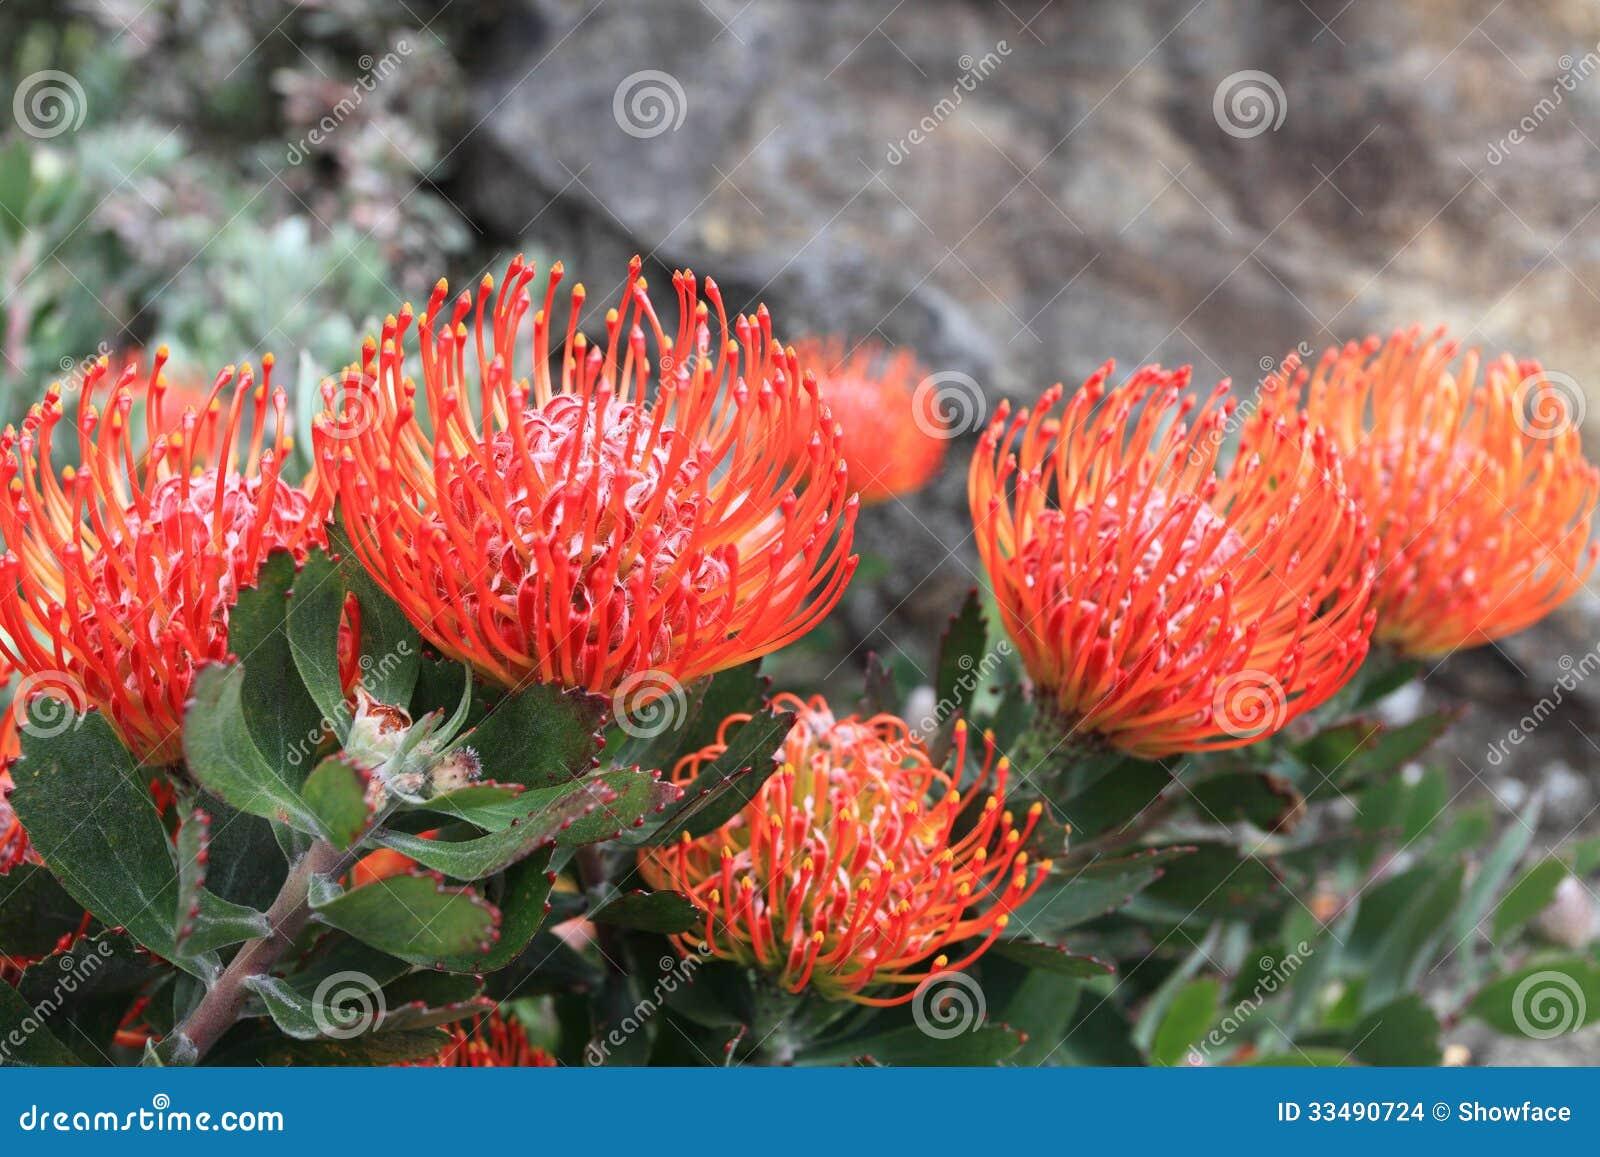 Garden Bush: Pincushion Protea Flowers Stock Images